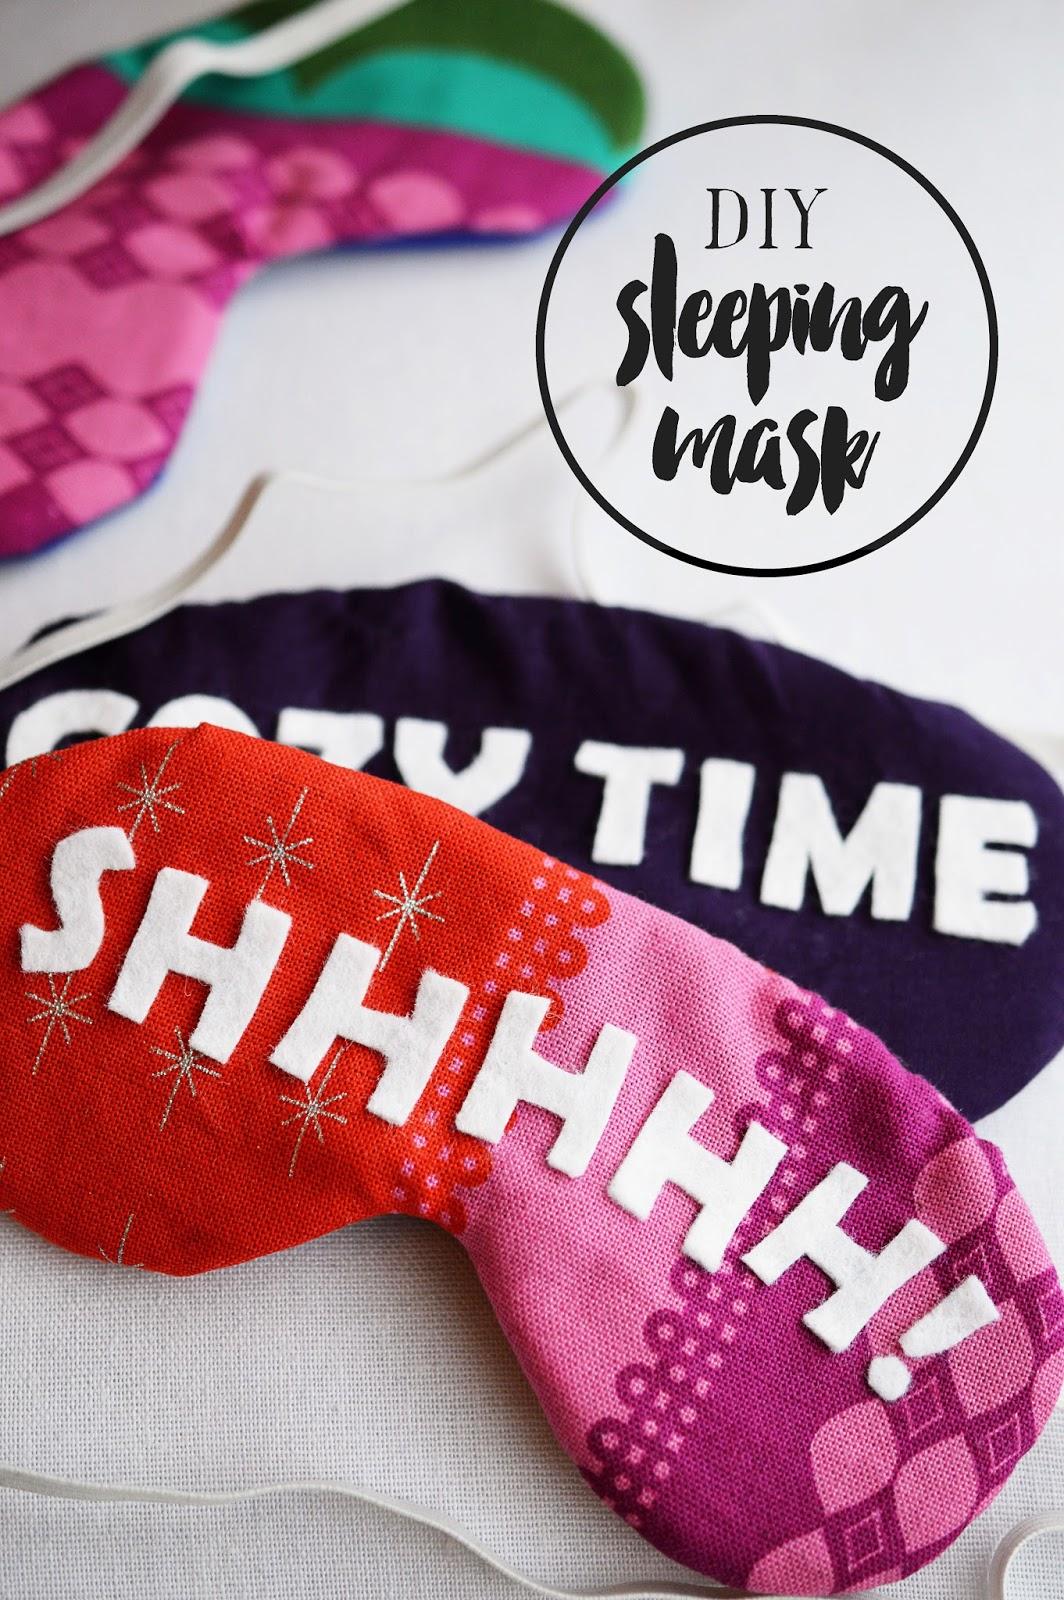 DIY Sleeping Mask | Motte's Blog